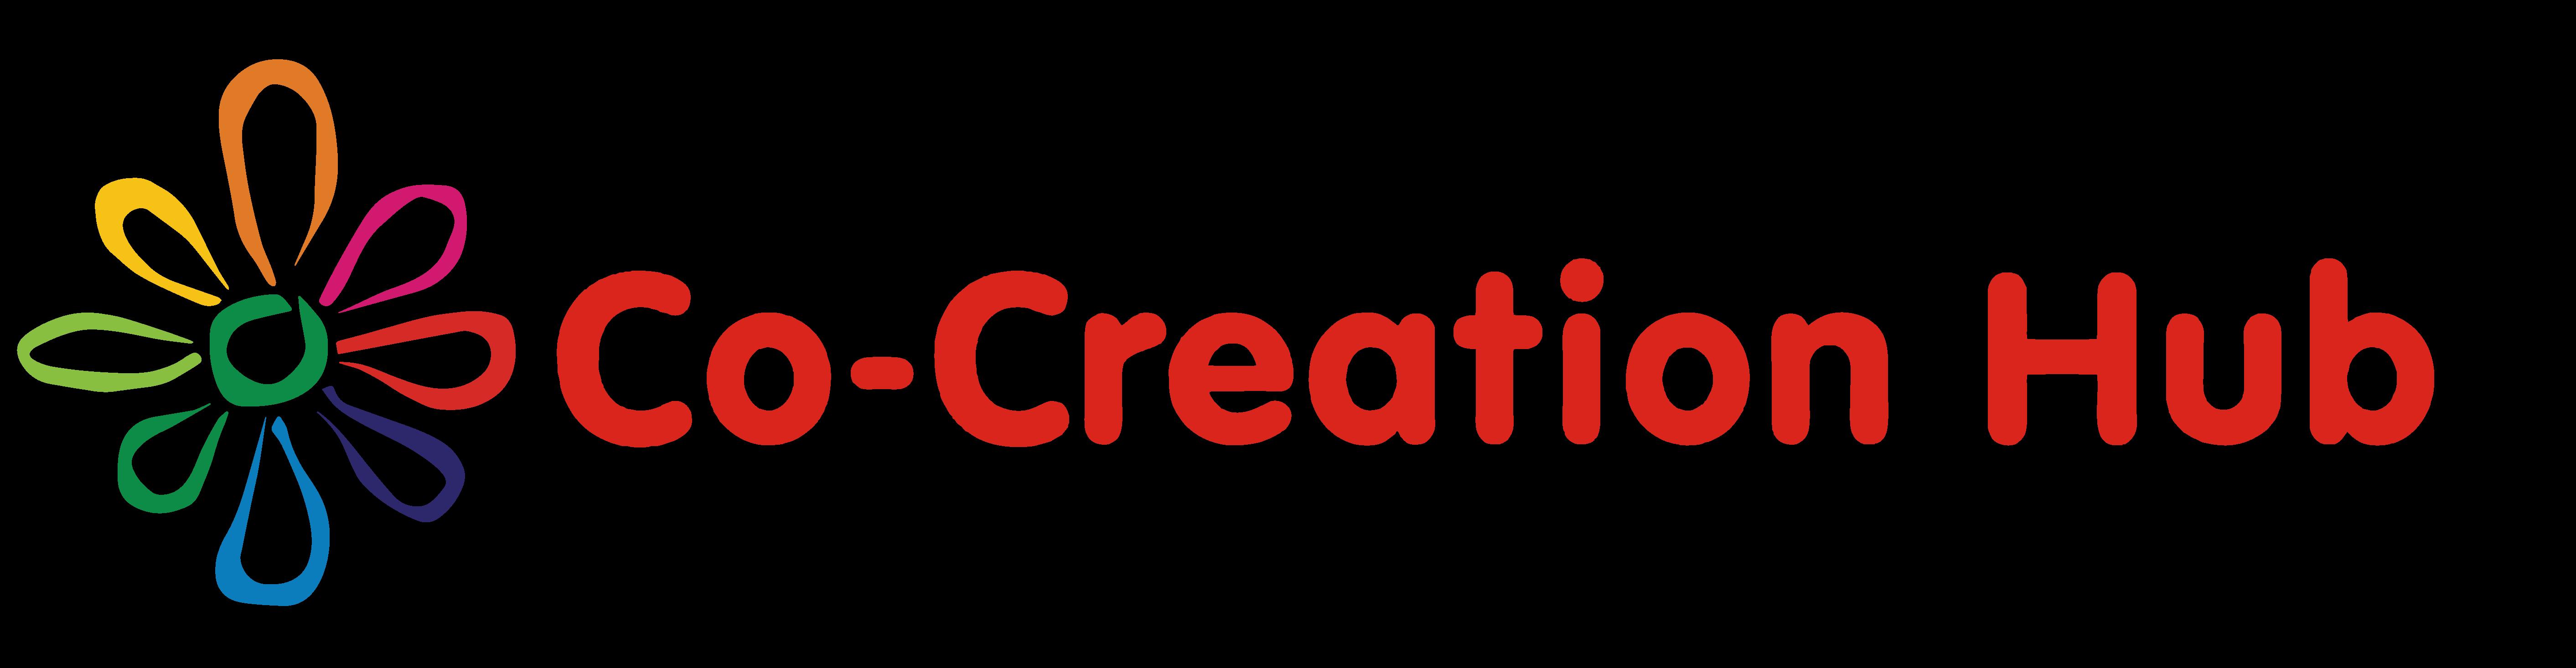 Home - Co-Creation Hub Nigeria (CcHUB) : Co-Creation Hub Nigeria (CcHUB)